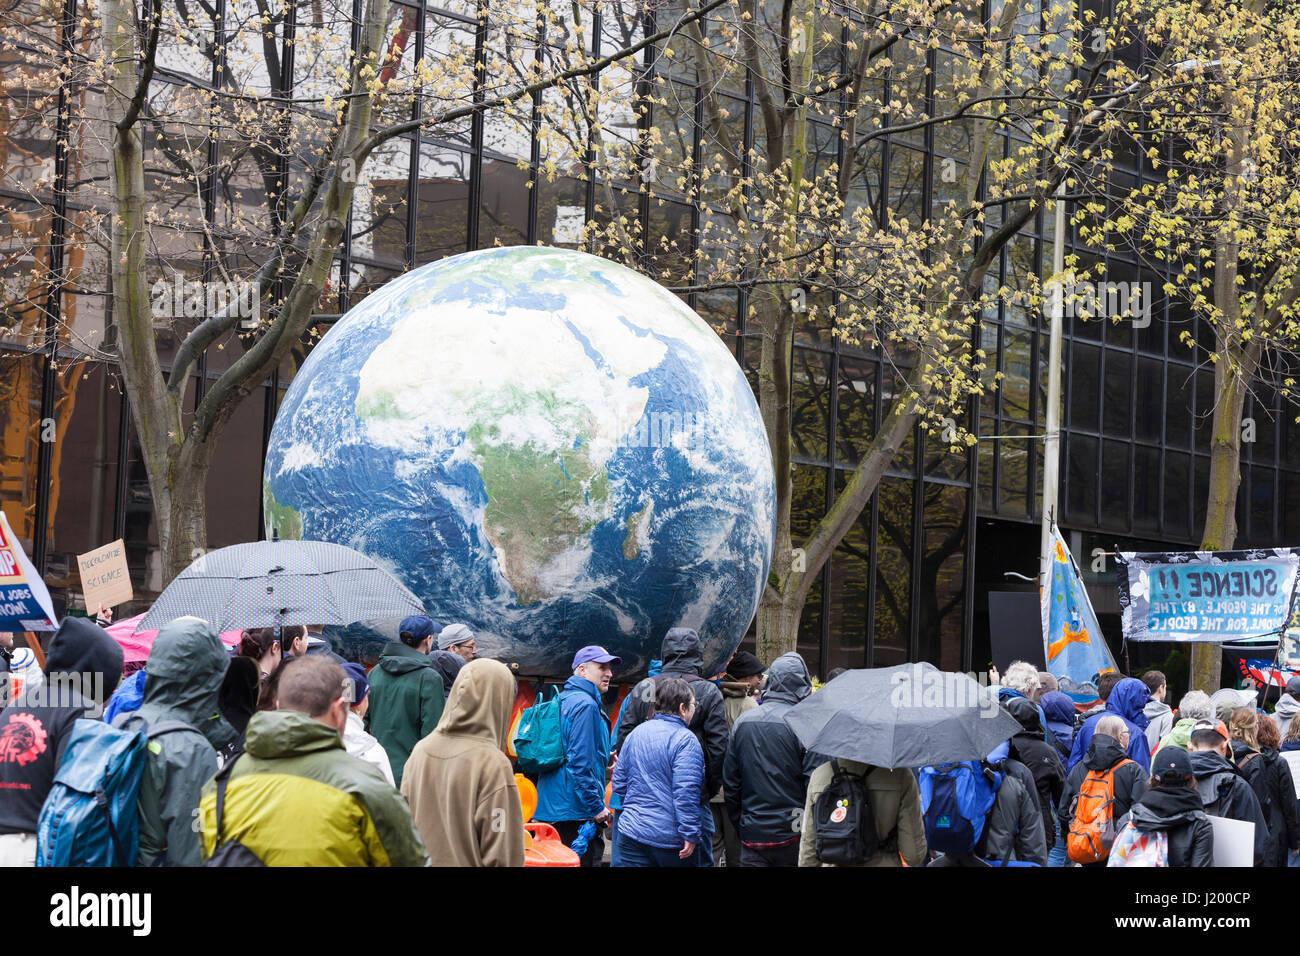 Seattle, Washington,USA. 22nd April, 2017. A large globe makes its way along 4th Avenue on its way to Seattle Center. Stock Photo